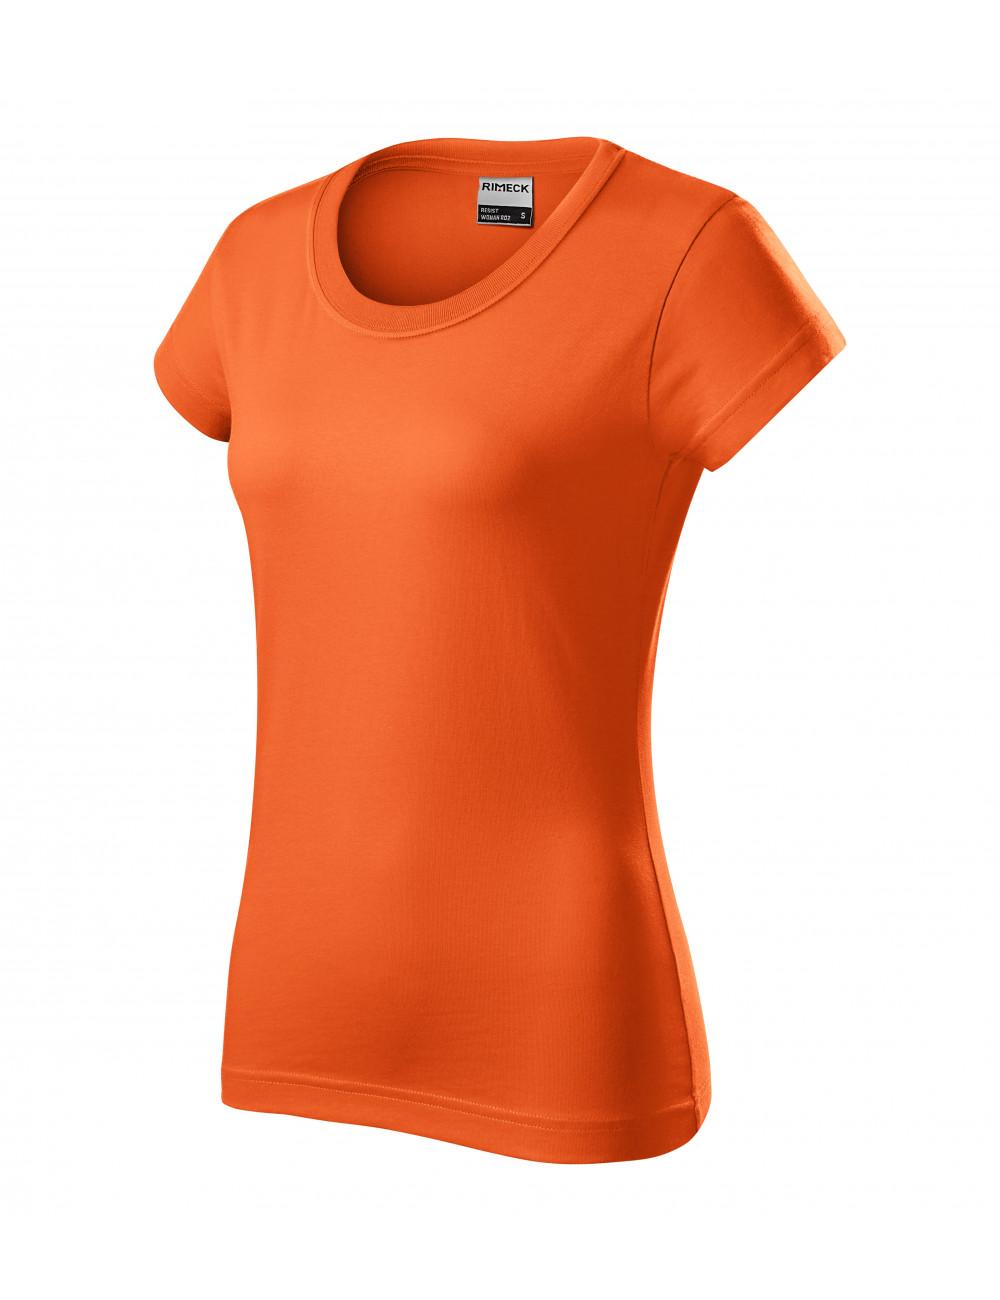 Adler RIMECK Koszulka damska Resist R02 pomarańczowy